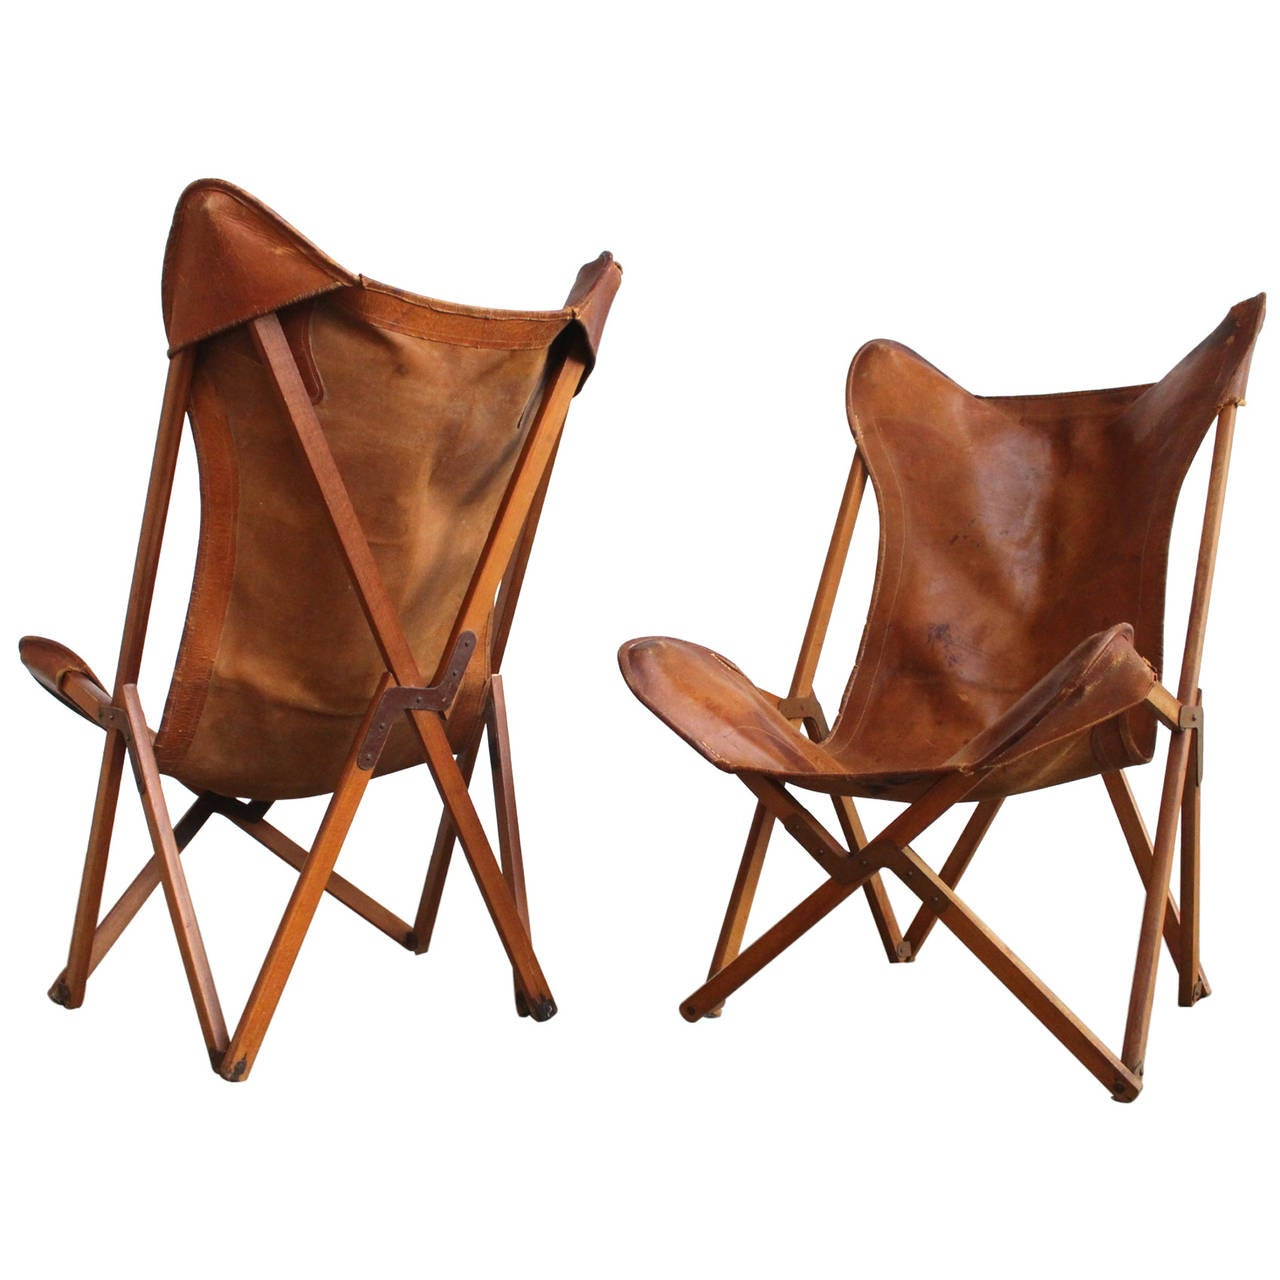 Very Rare Original Stamped Tripolina Chairs by Joseph